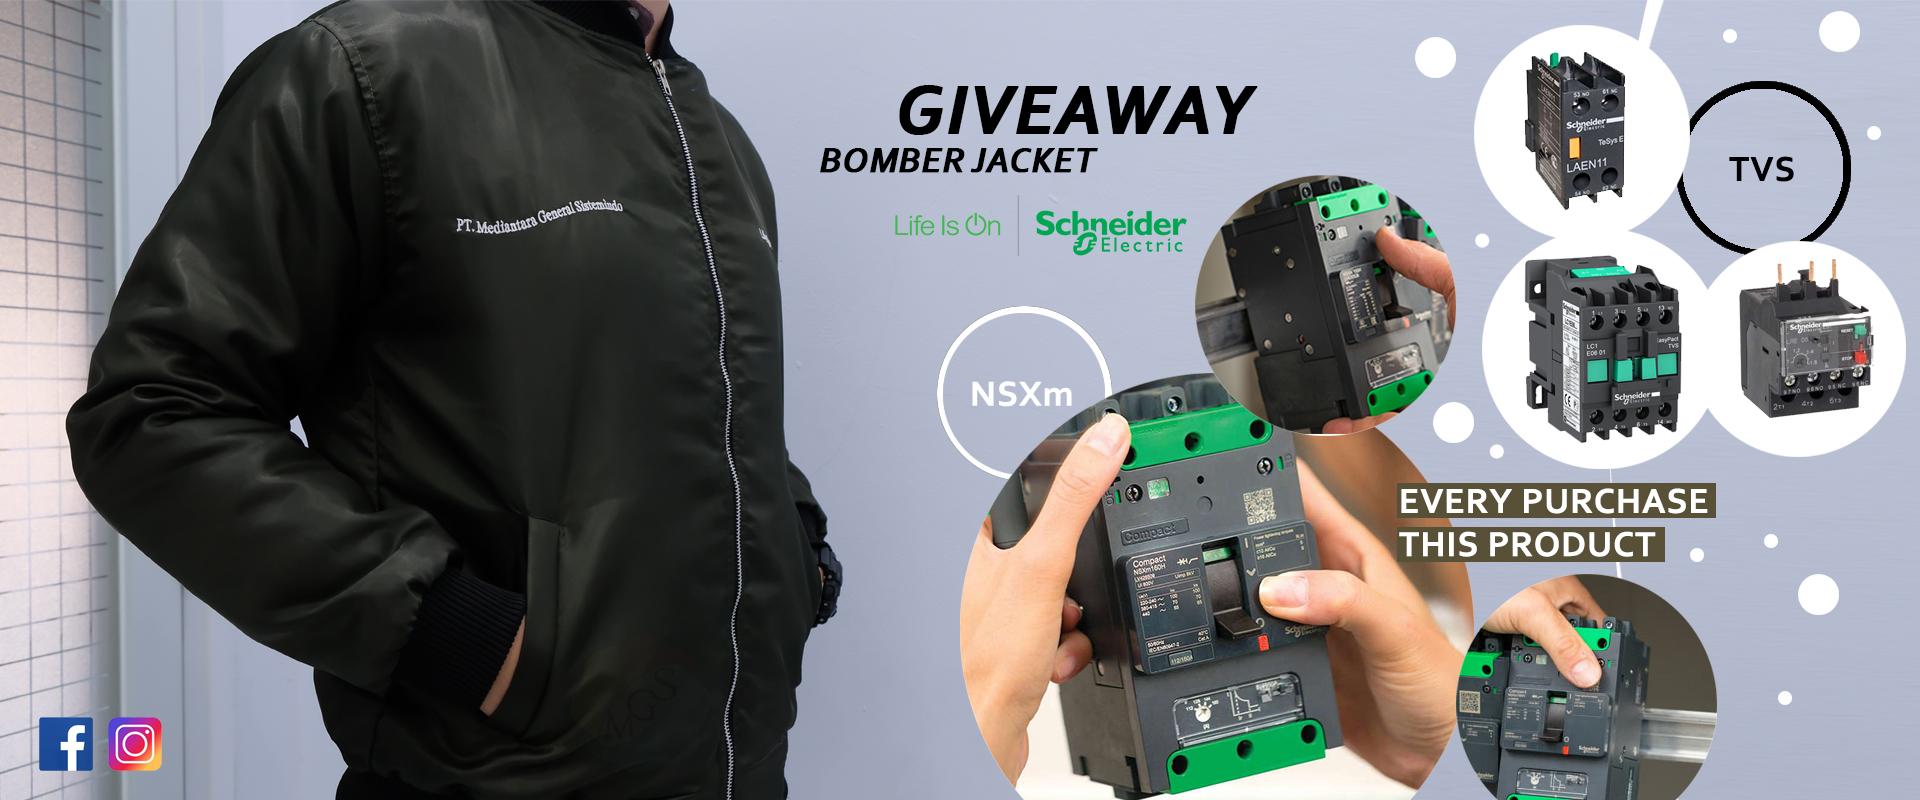 Giveaway Bomber Jacket